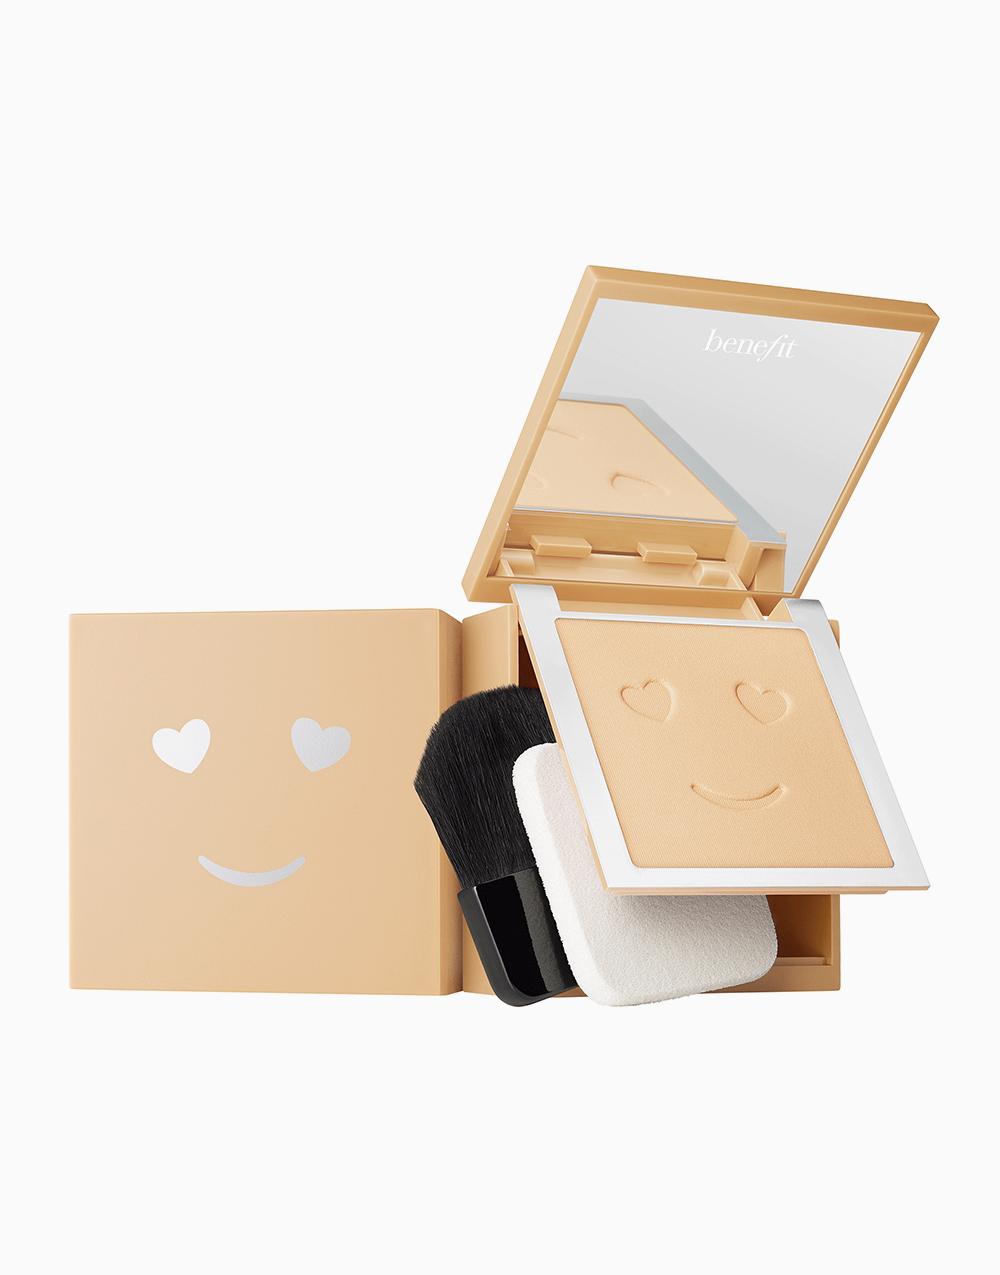 Hello Happy Velvet Powder Foundation by Benefit | Shade 01